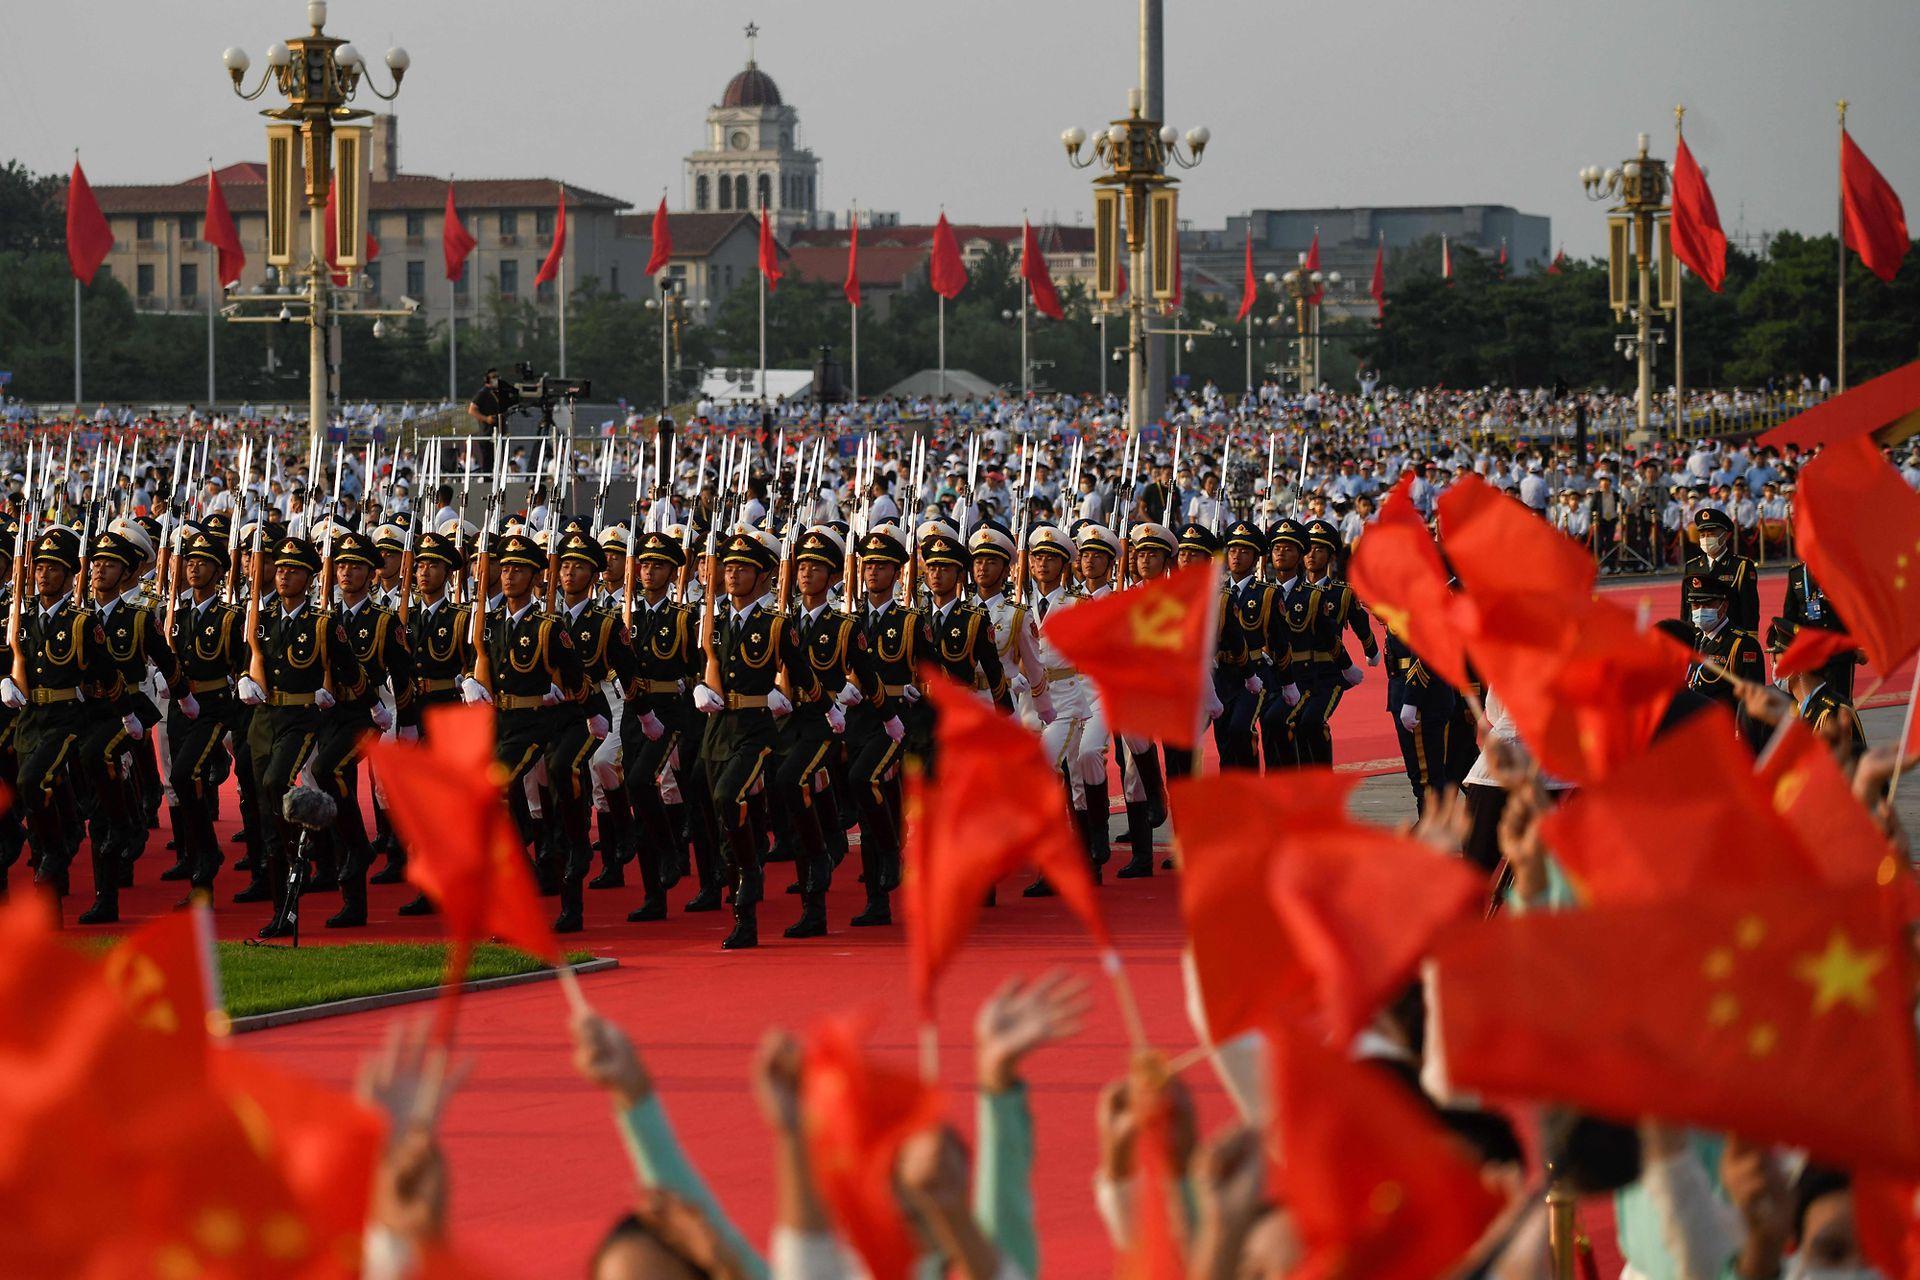 Vista del espectacular desfile